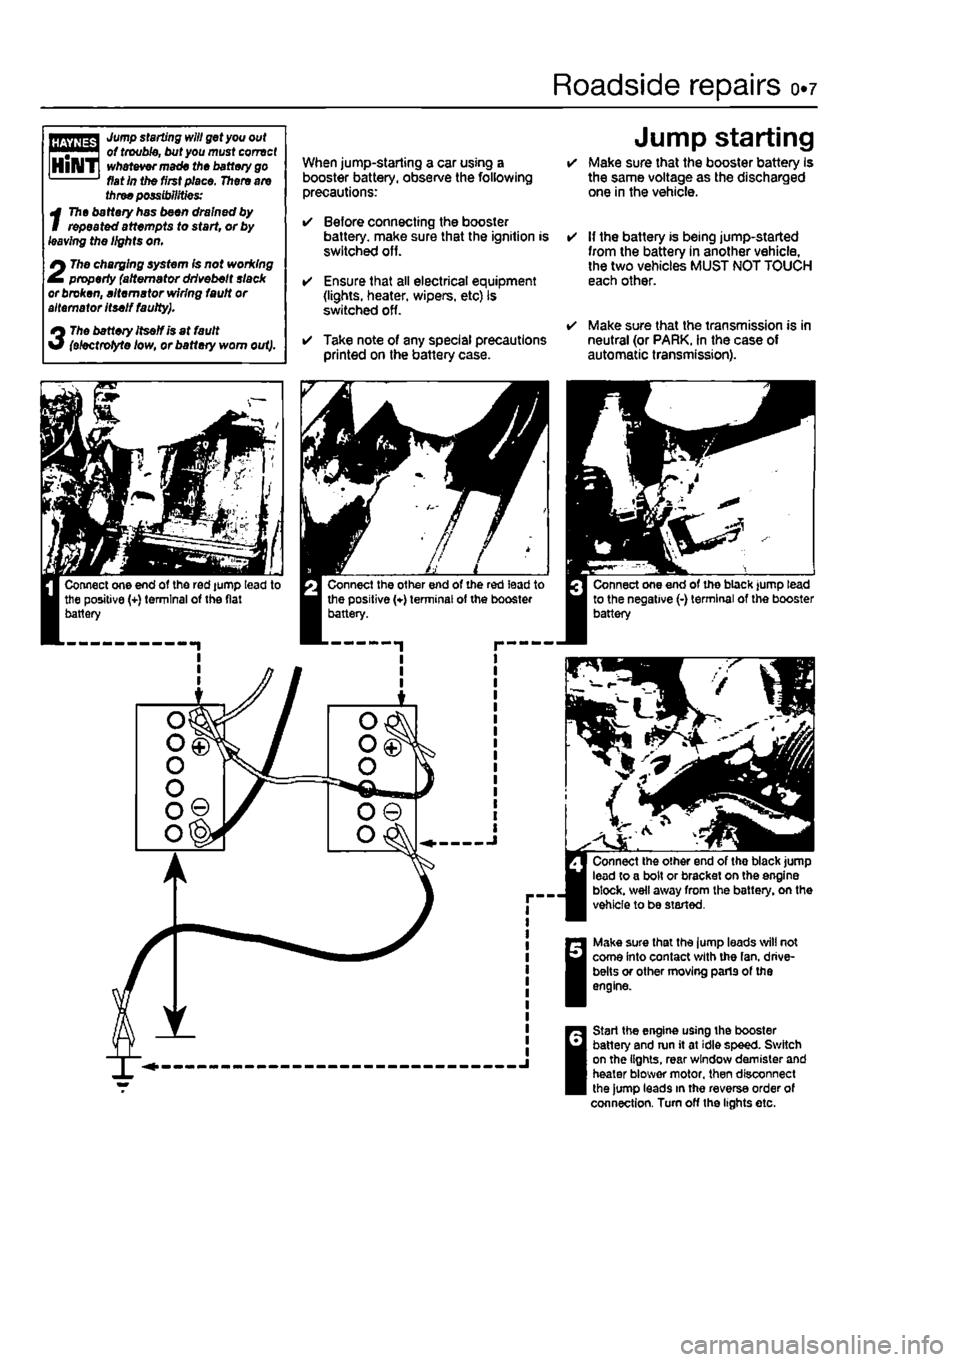 1983 pontiac grand prix schema cablage